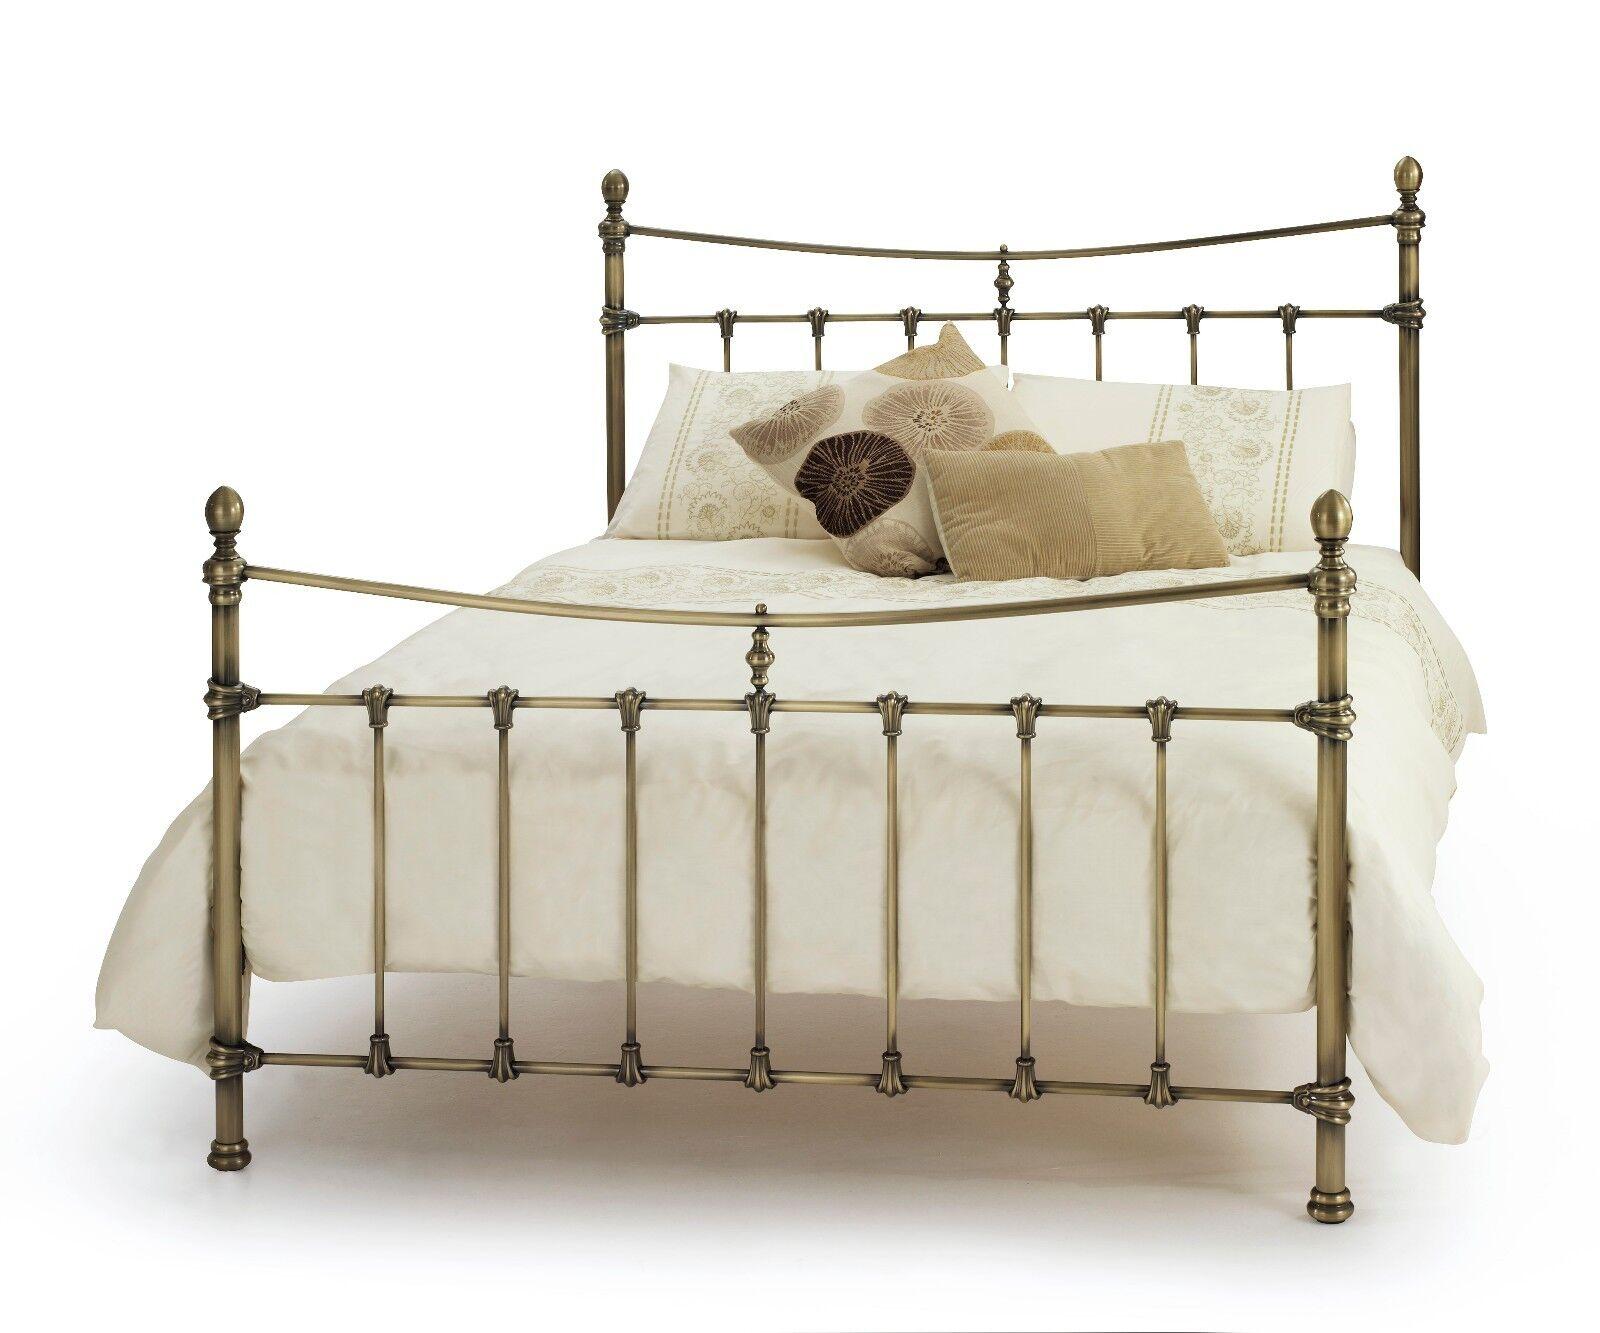 Estelle Georgian Quality Metal Bed Frame In Antique Brass